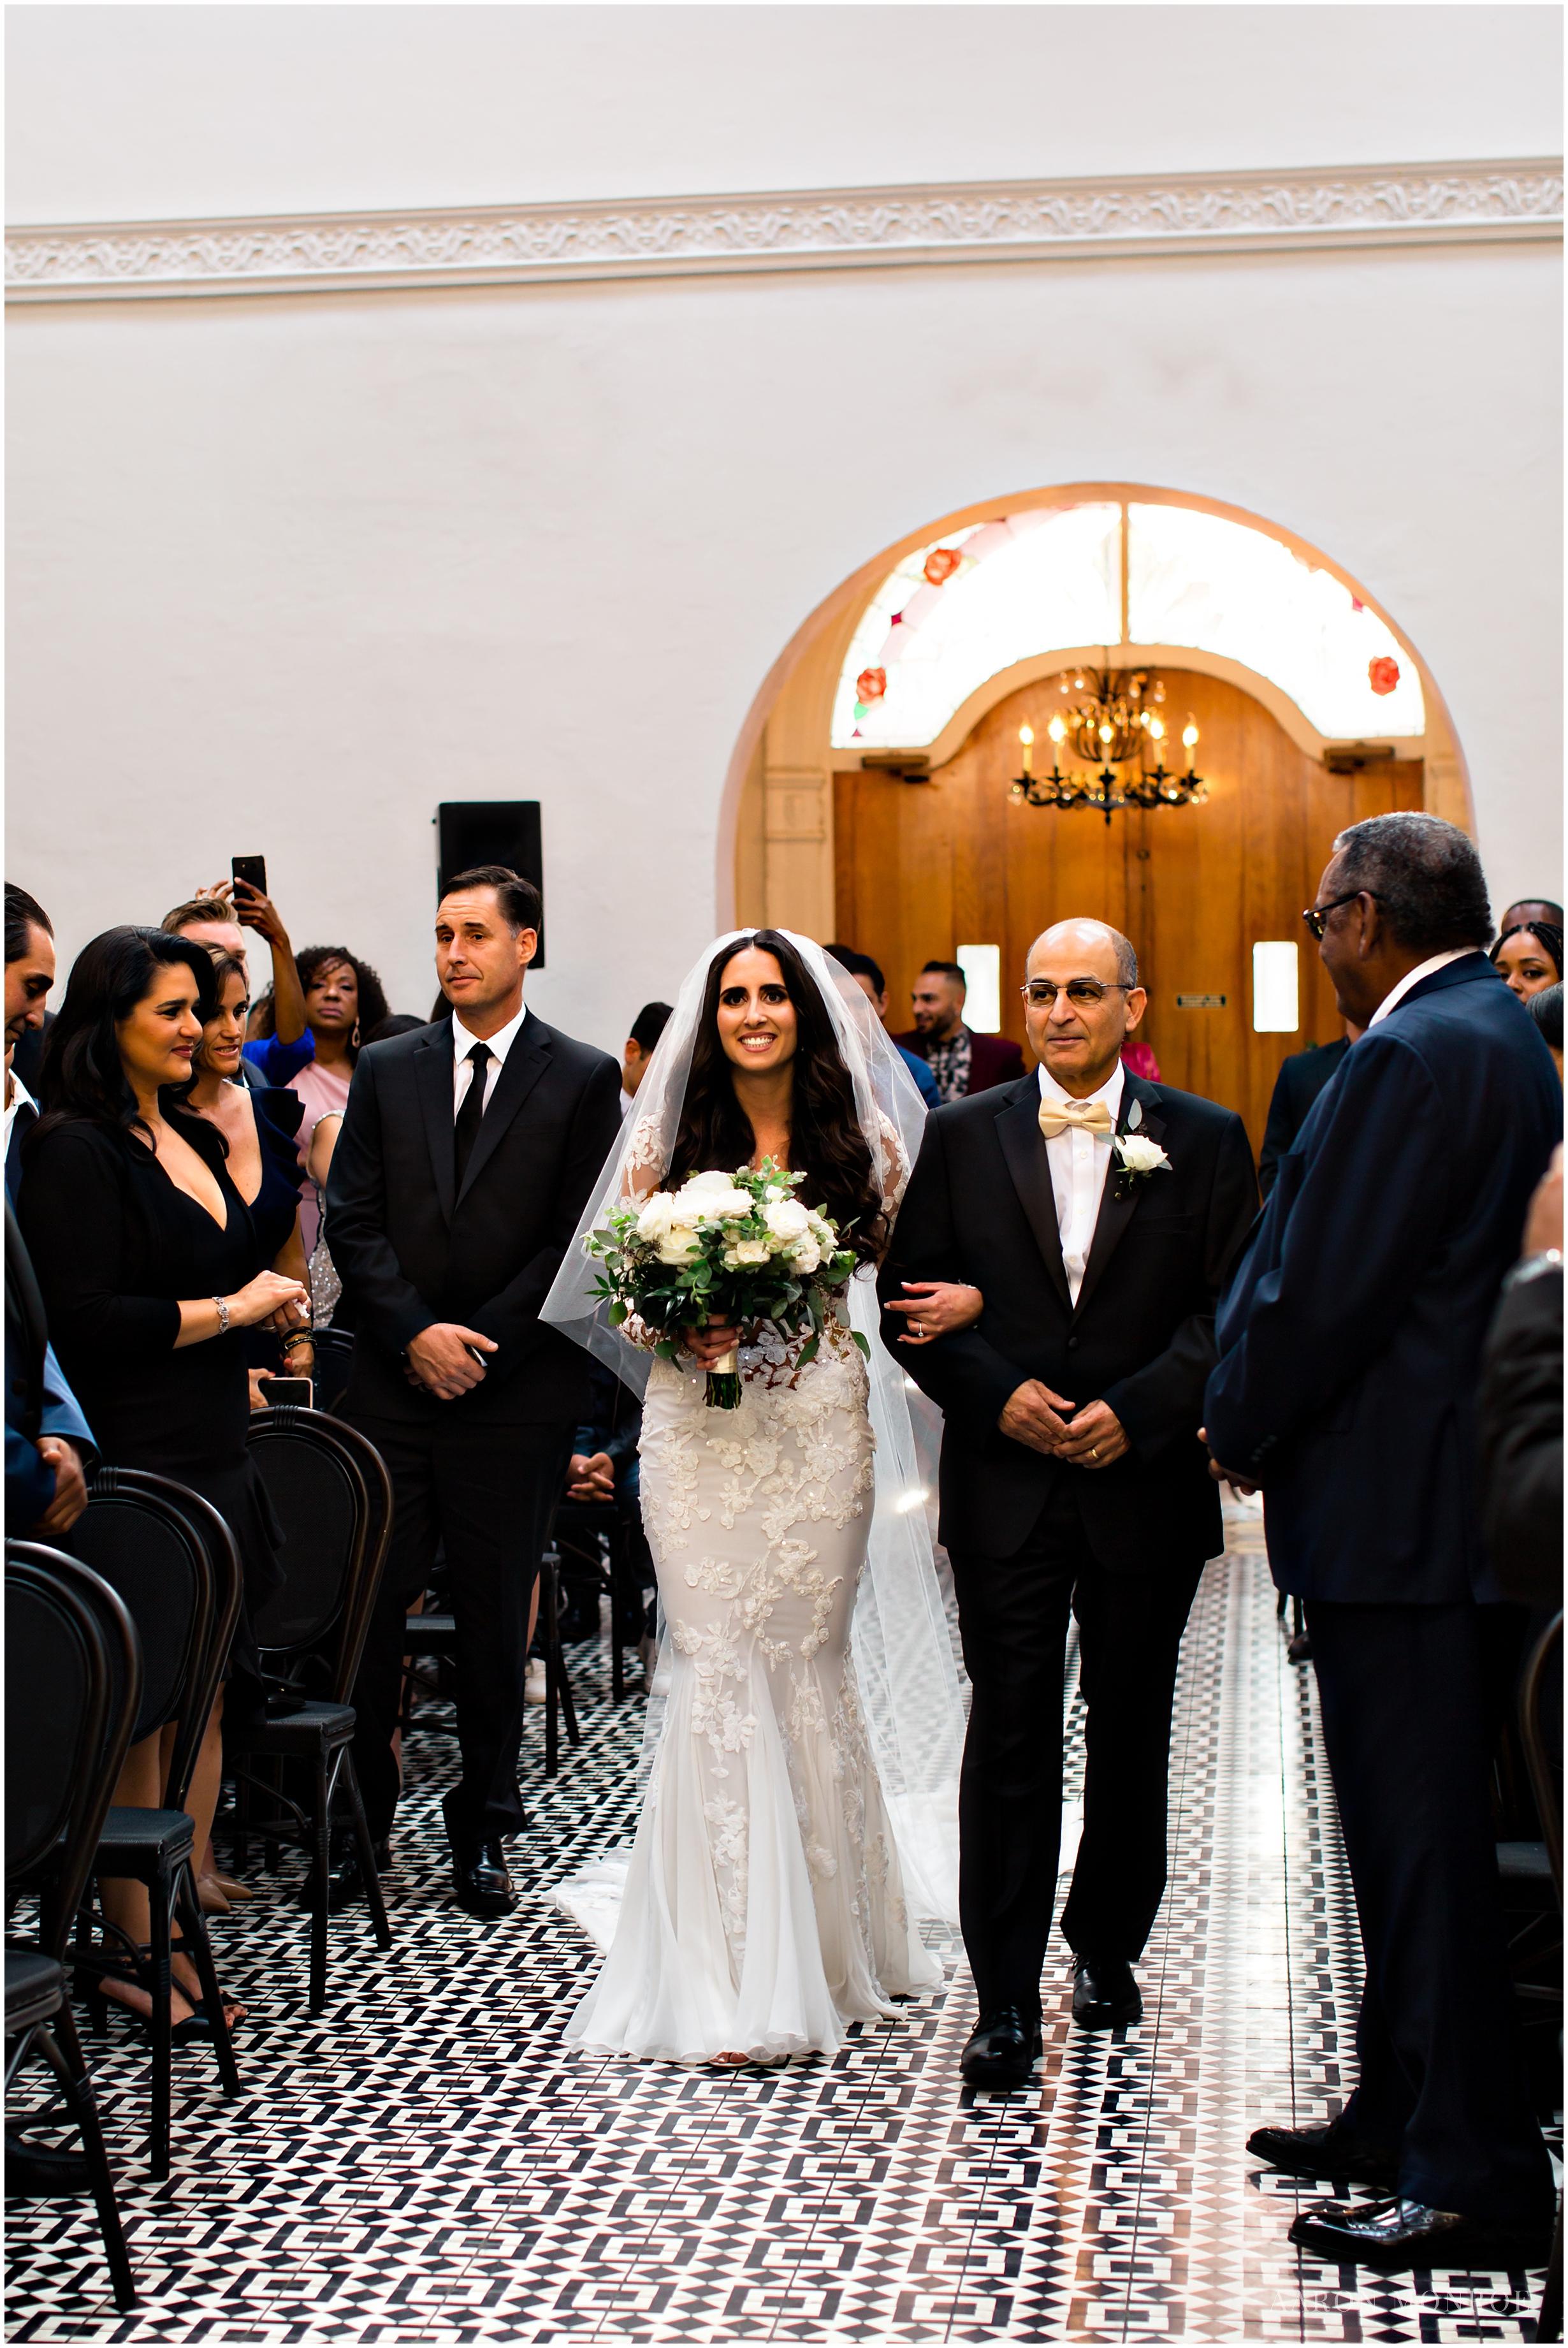 Ebell_Long_Beach_Wedding_Photography_0825.jpg